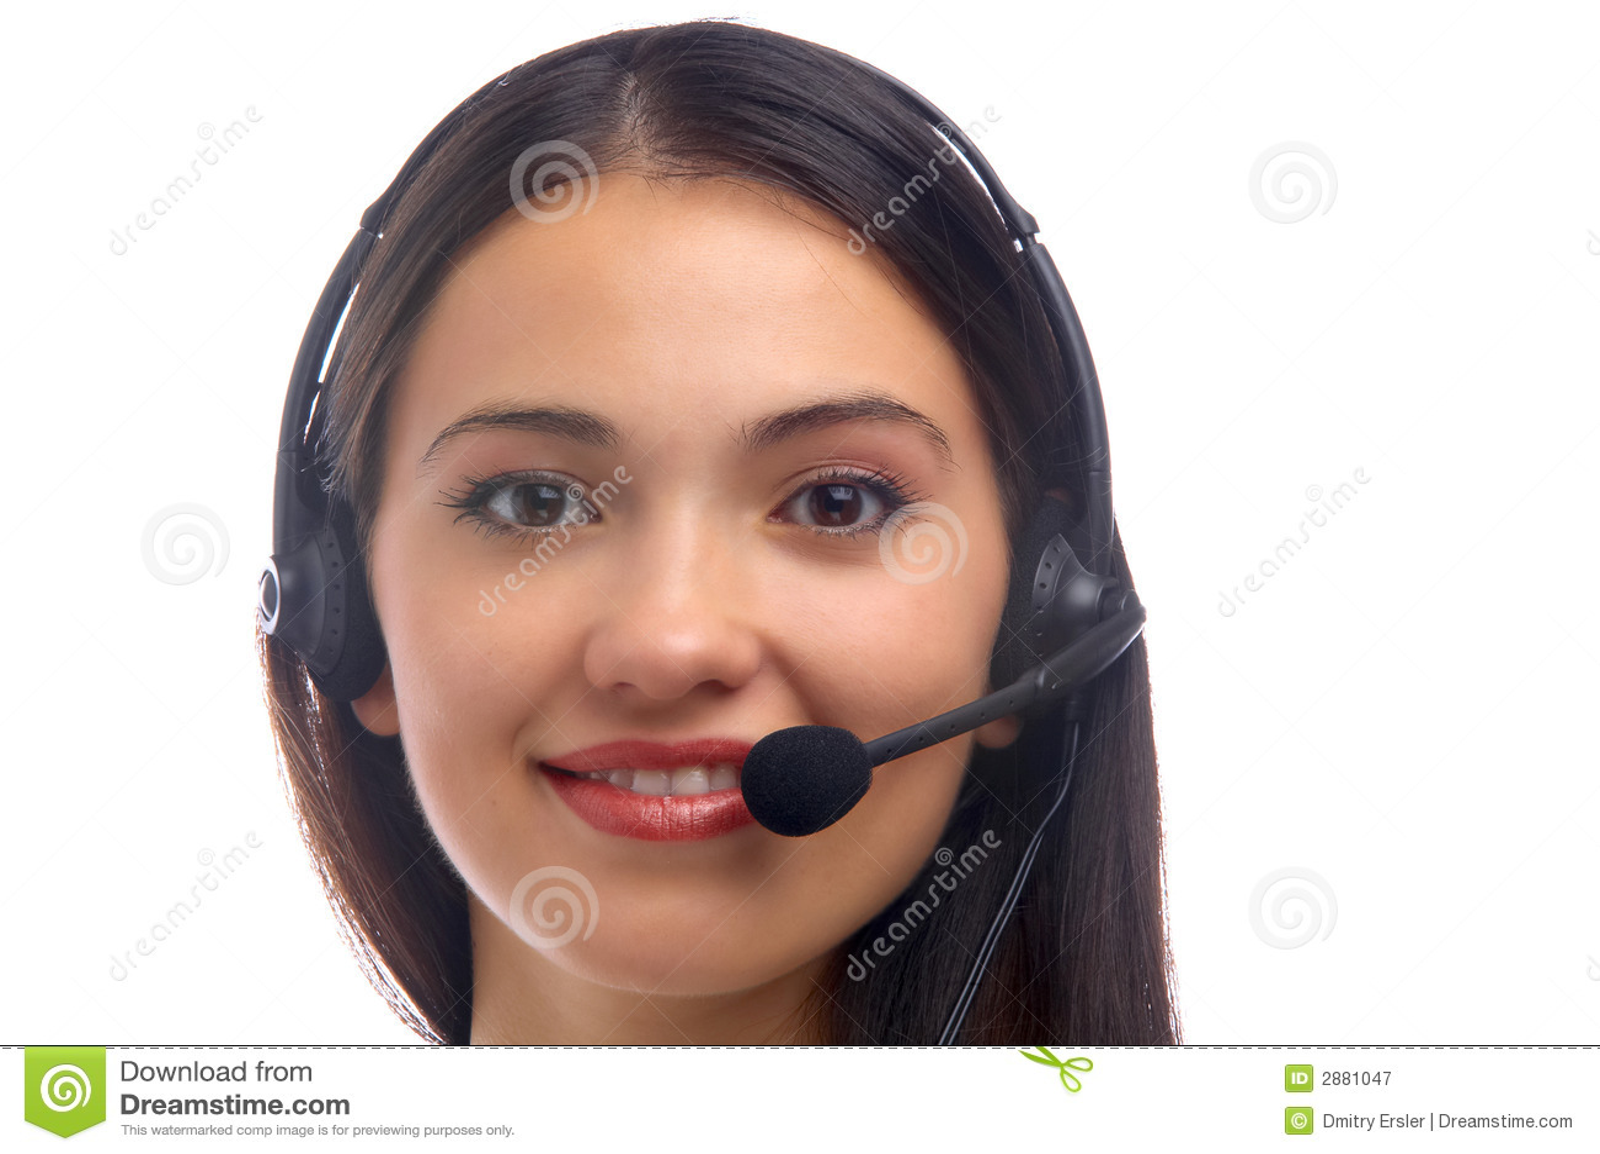 office face